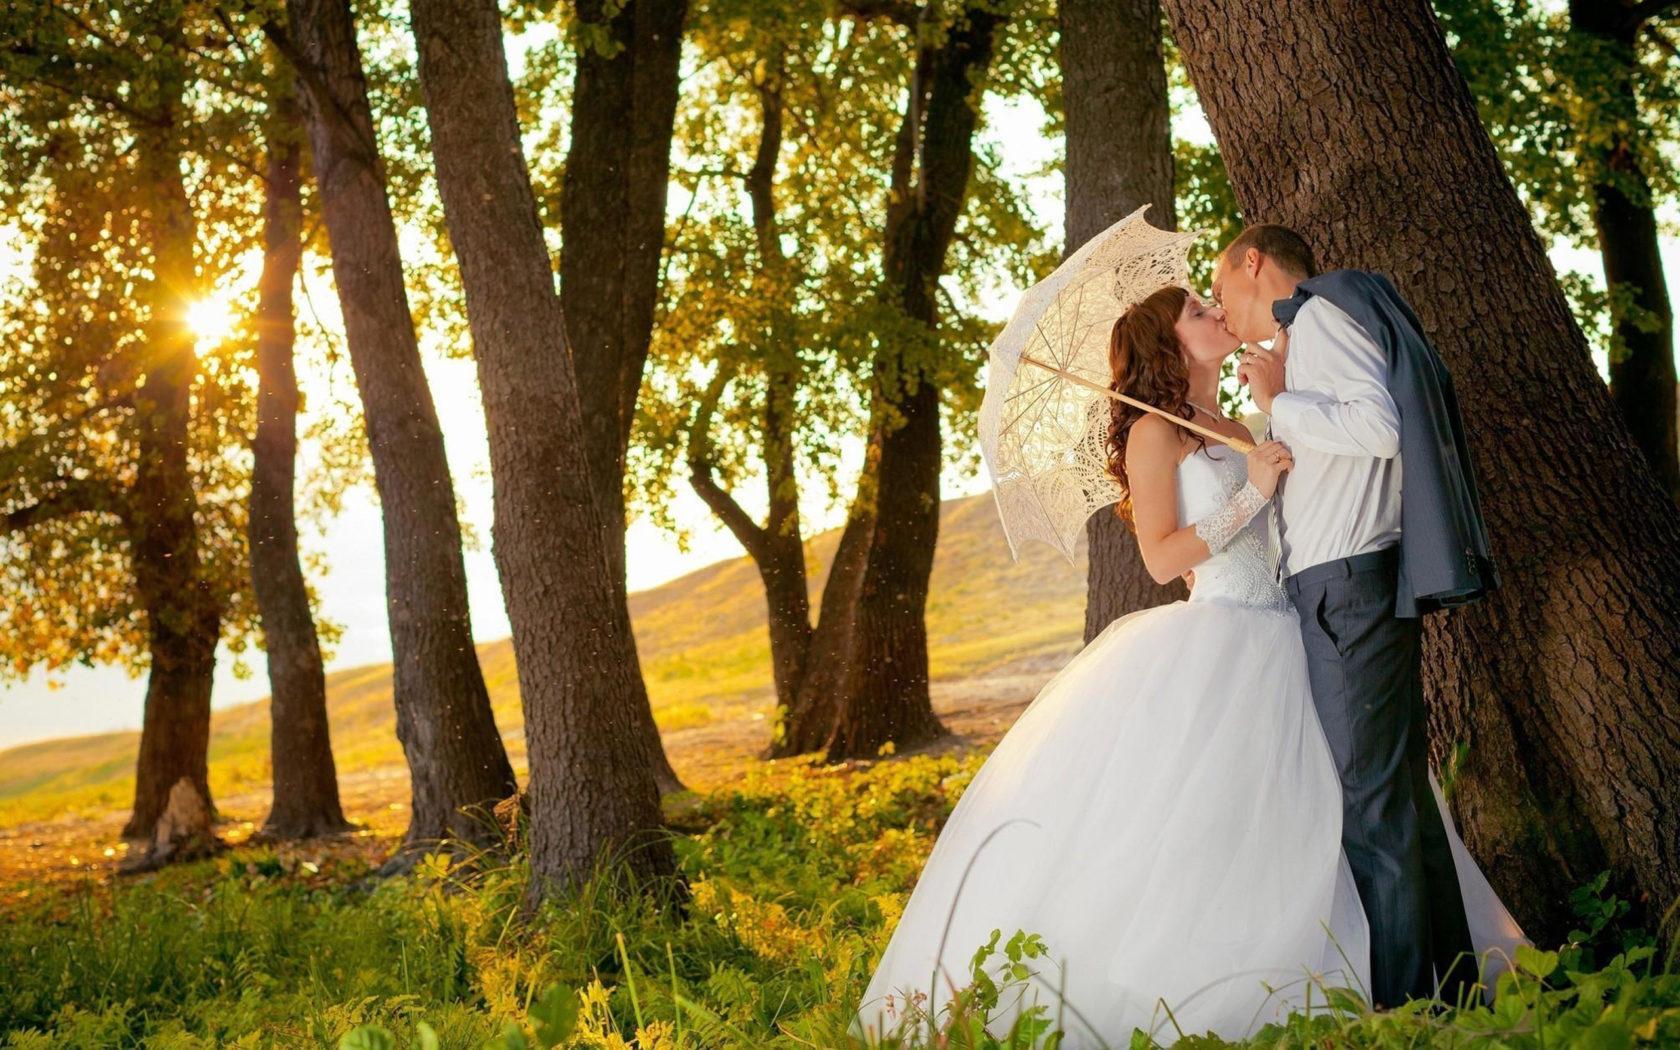 Cute Couple Kissing Wallpaper Download Kissing Under Trees Romantic Couple Wallpaper Kissing